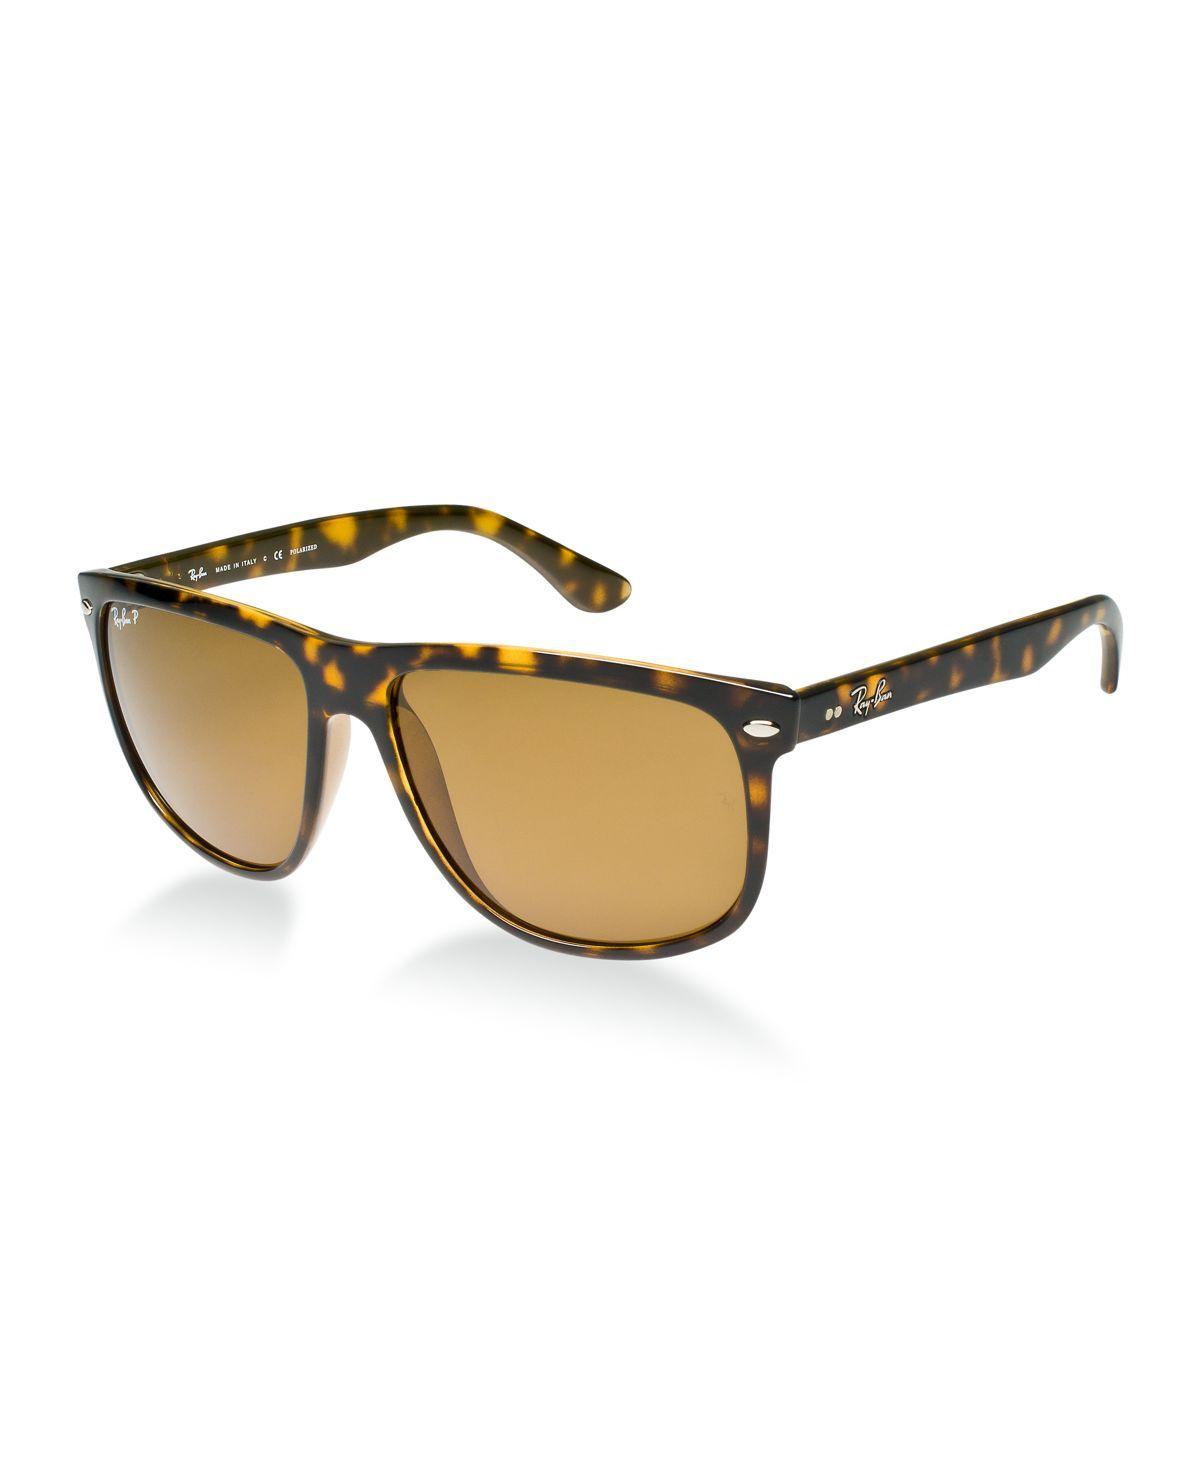 39af2b84587 Polarized Sunglasses